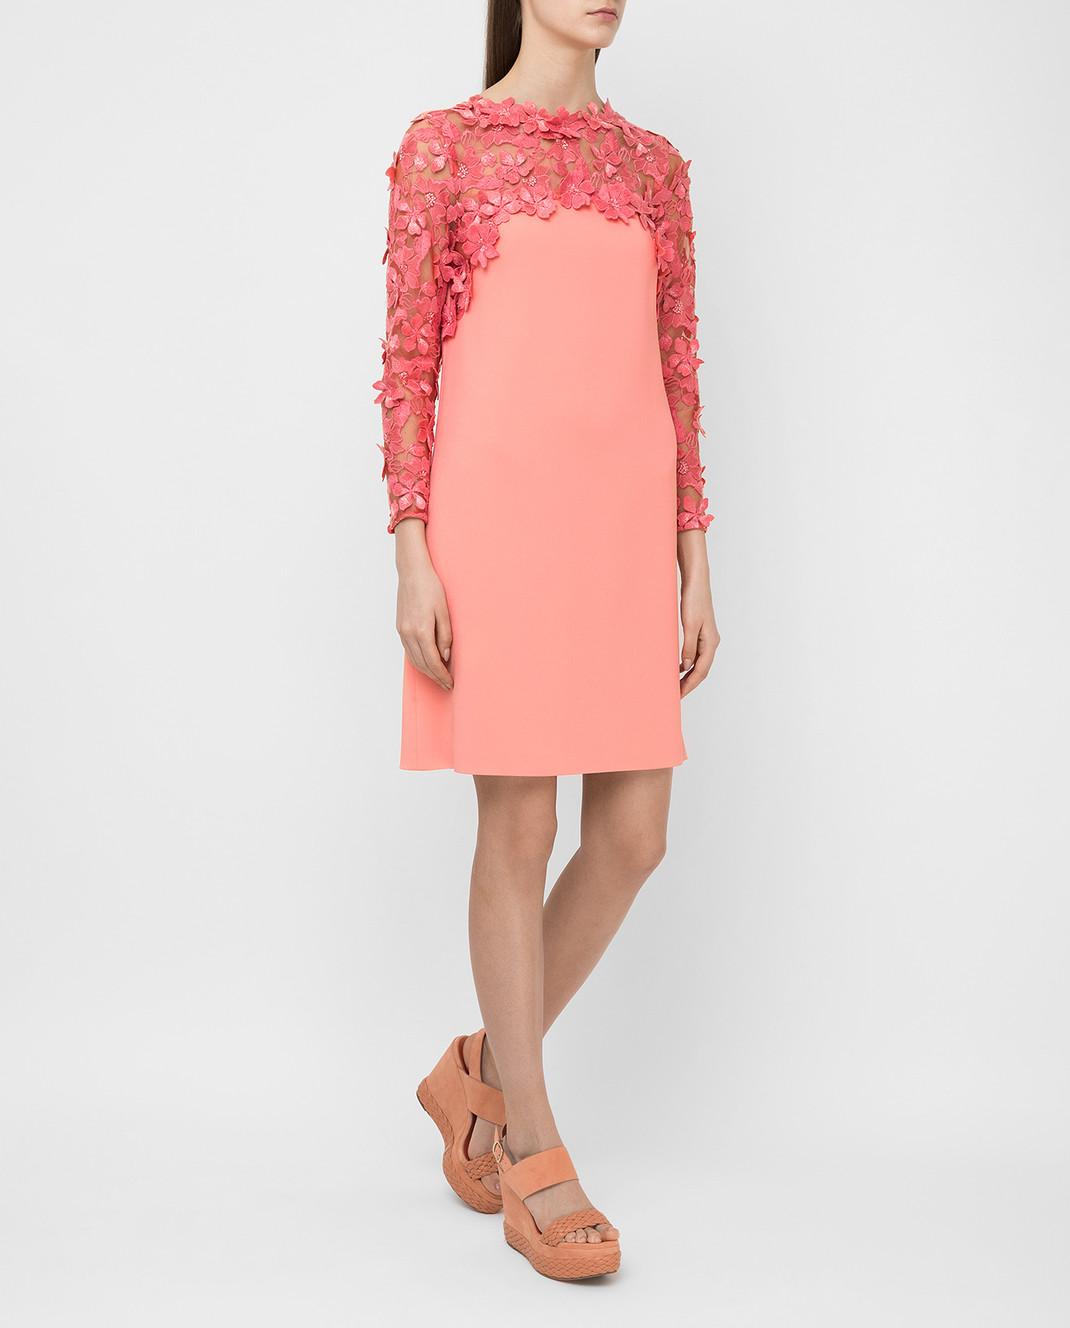 Giamba Коралловое платье PG5270 изображение 2